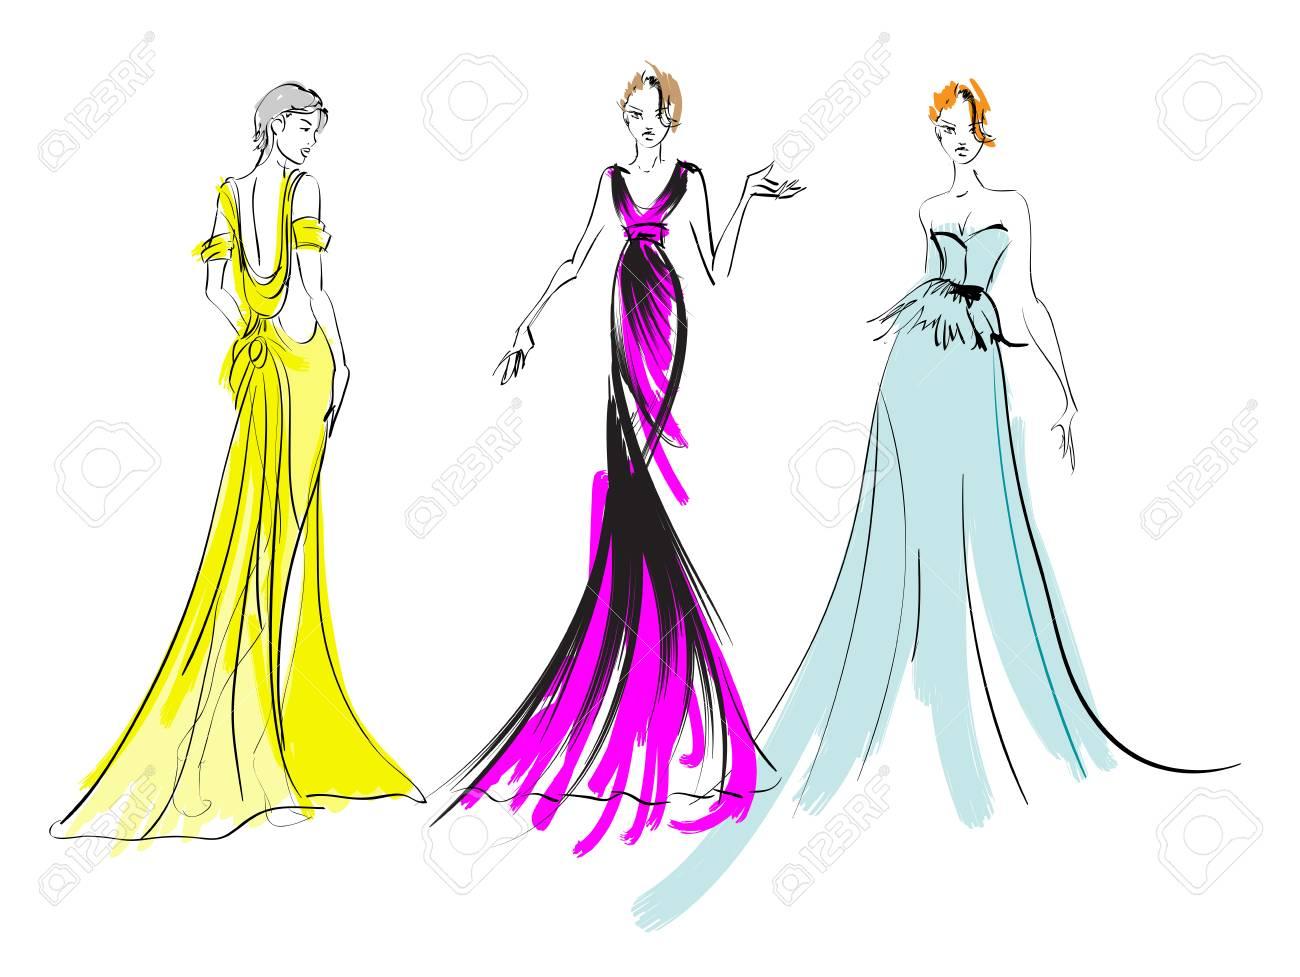 Fashion Girls Sketch Fashion Illustration Drawing Fashion Models Royalty Free Cliparts Vectors And Stock Illustration Image 113829479